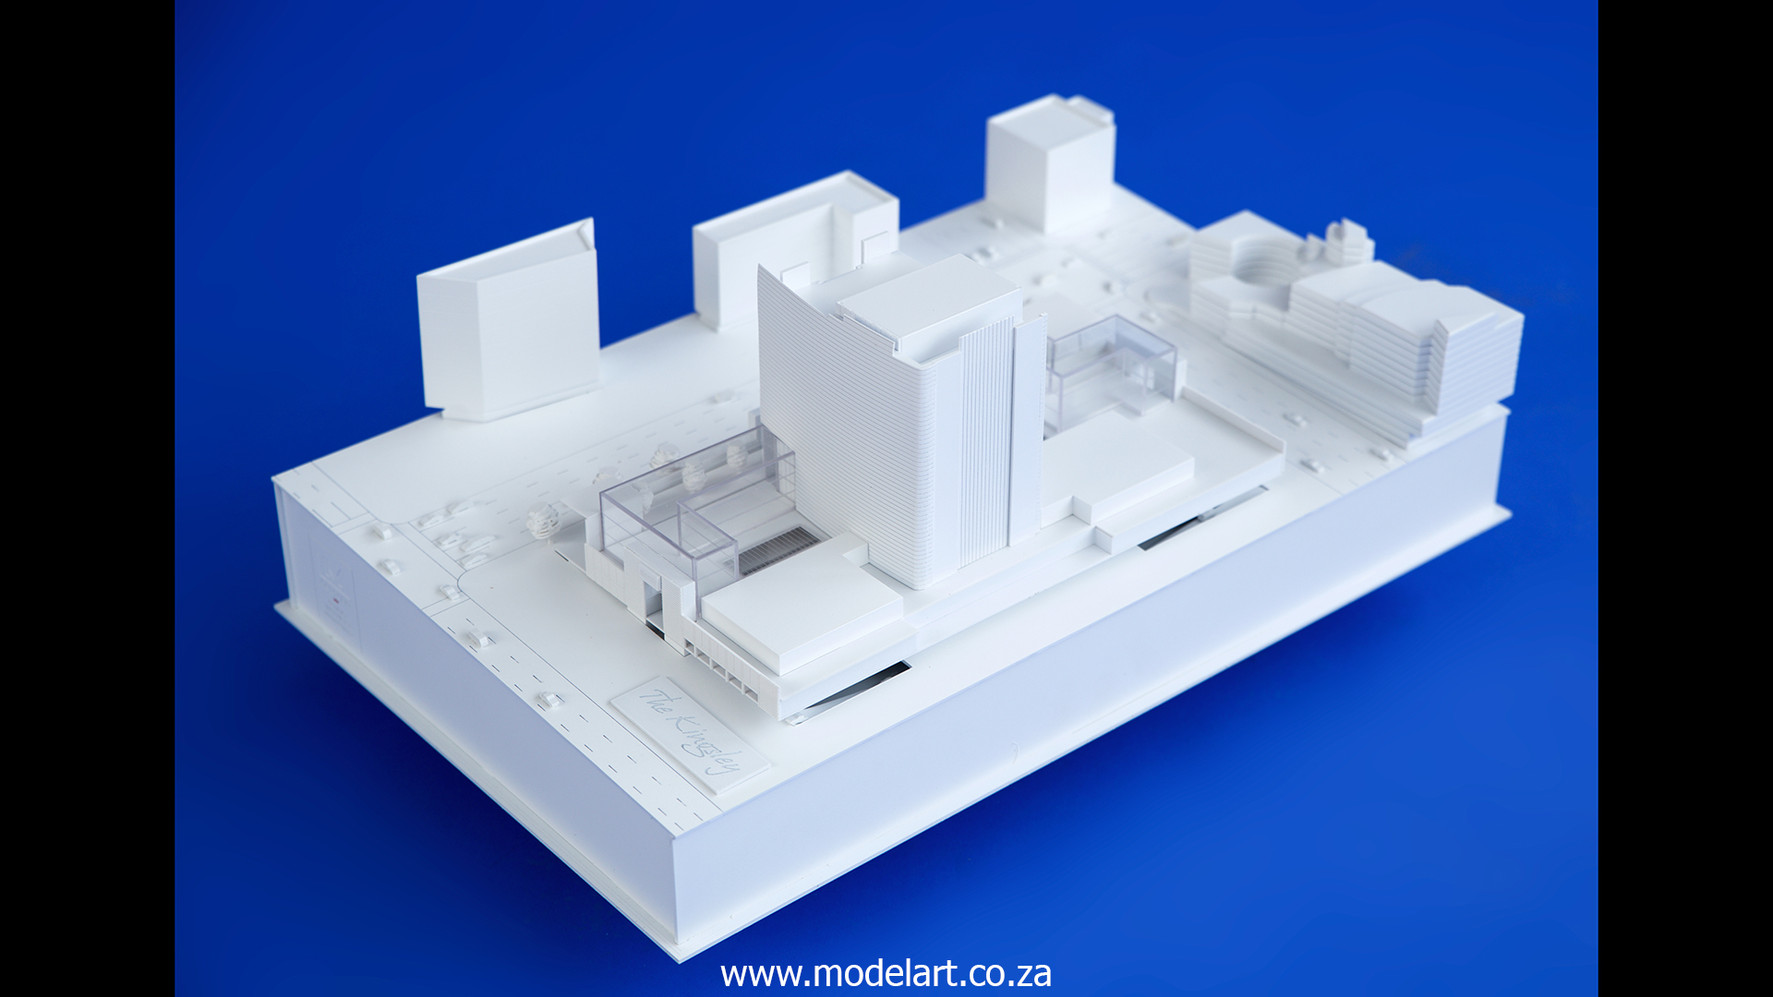 Architectural-Scale-Model-Conceptual-Kingsley Centre-2